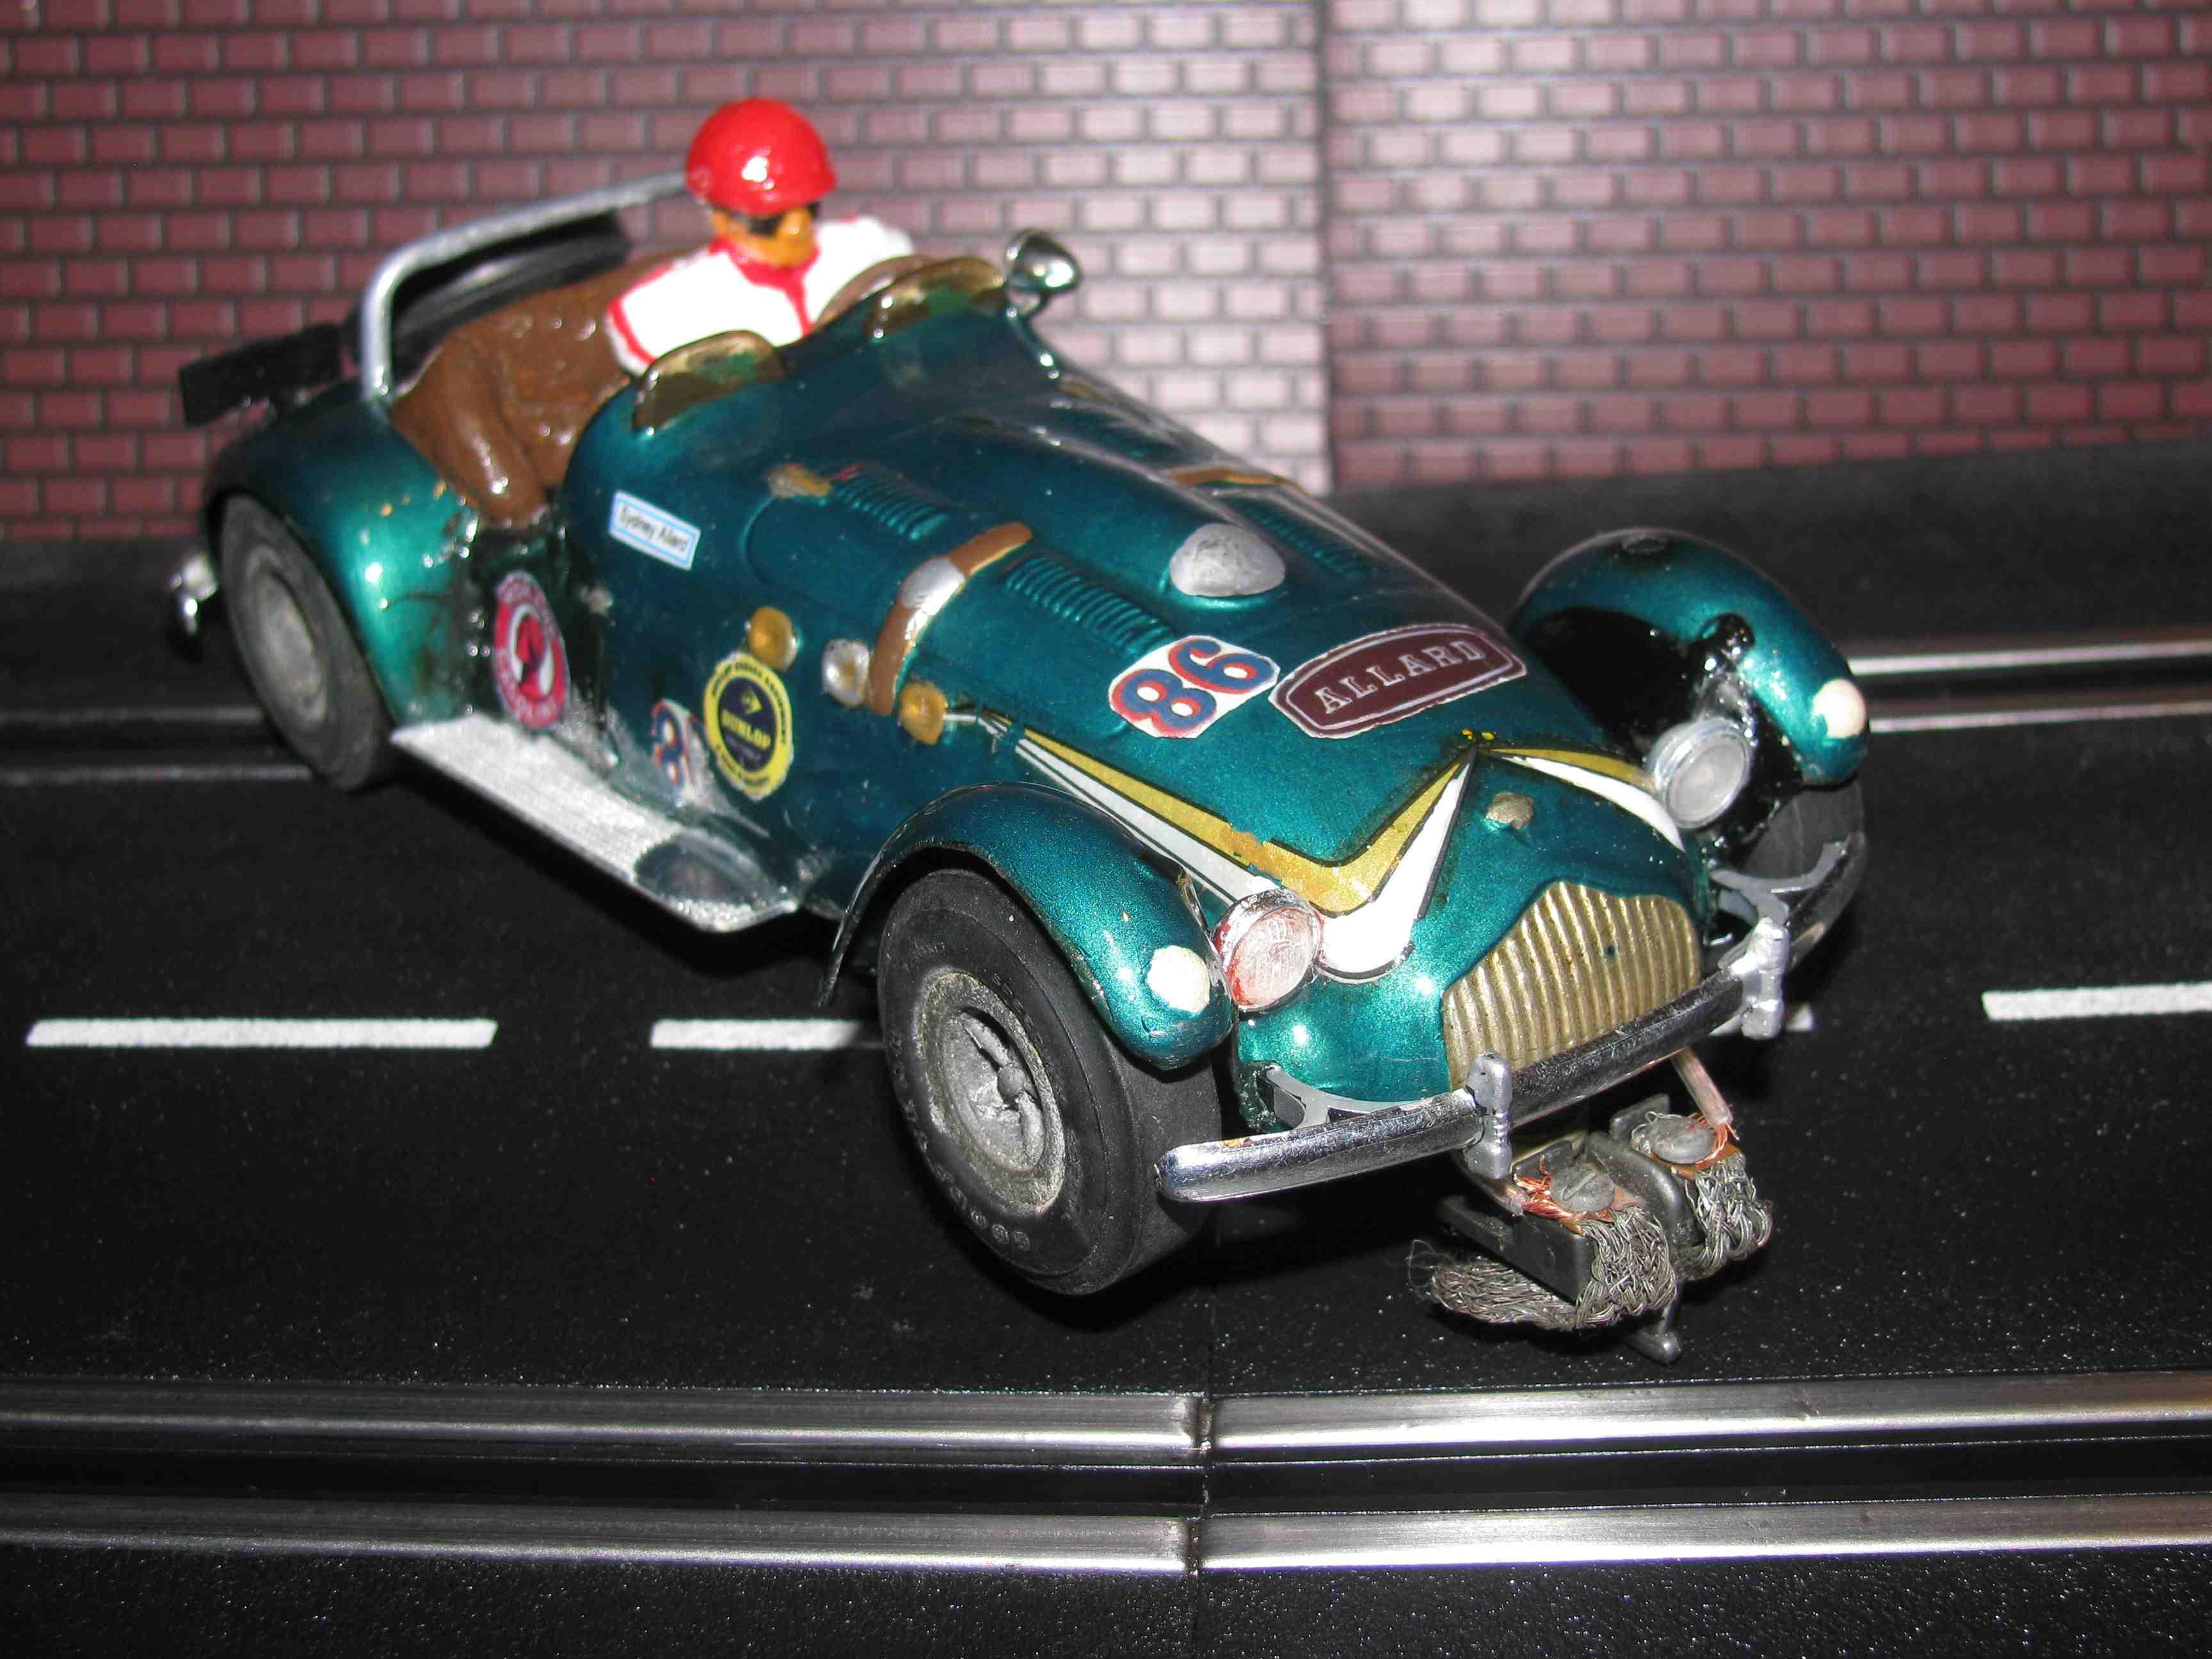 * SOLD * 1954 ALLARD J2X SLOT CAR – 1/24 Scale – Vintage Roadster